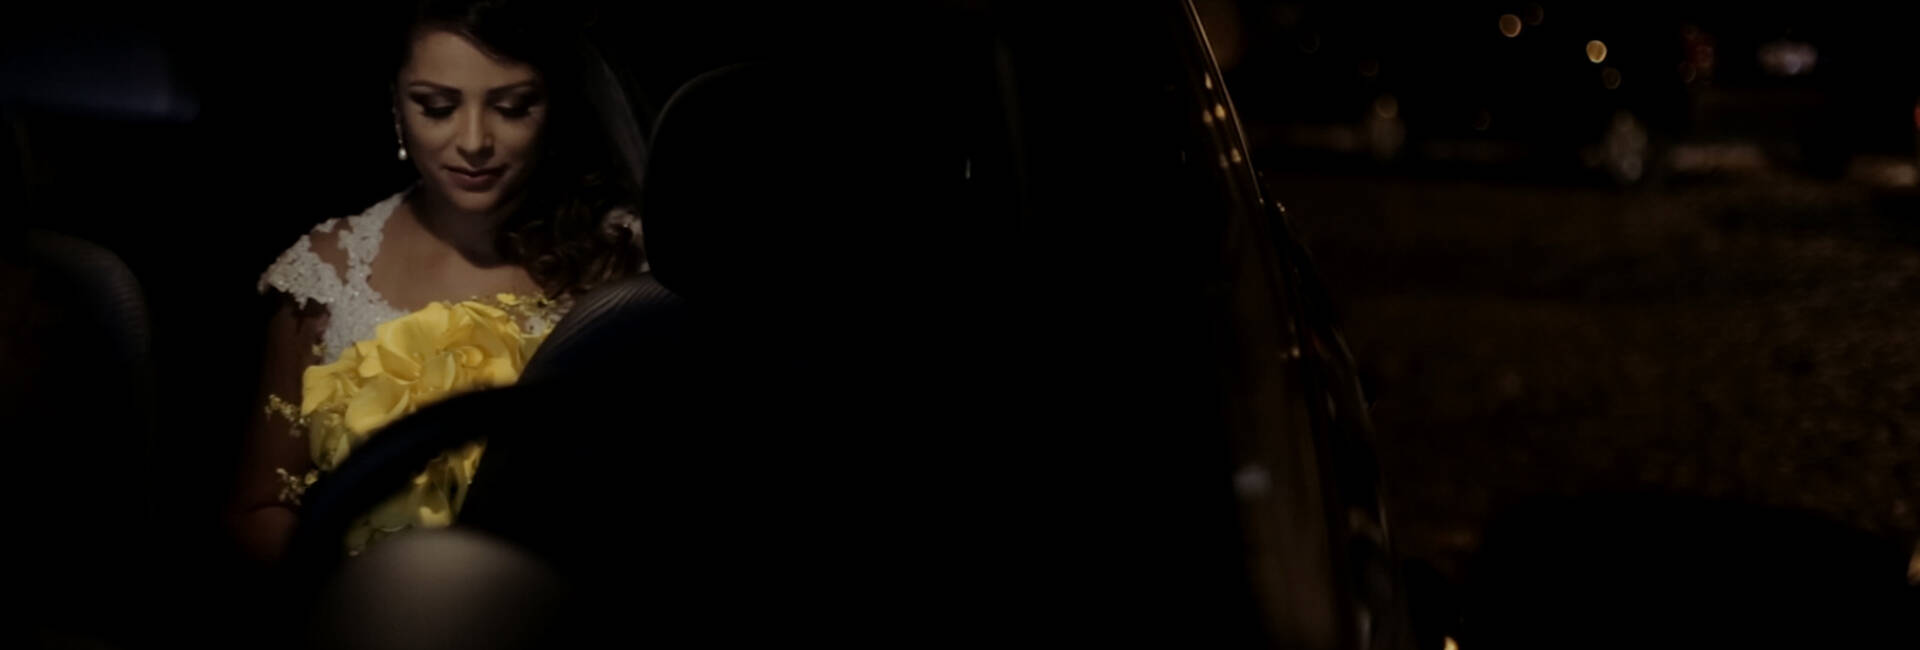 Trailer de Casamento de Natália e Thiago